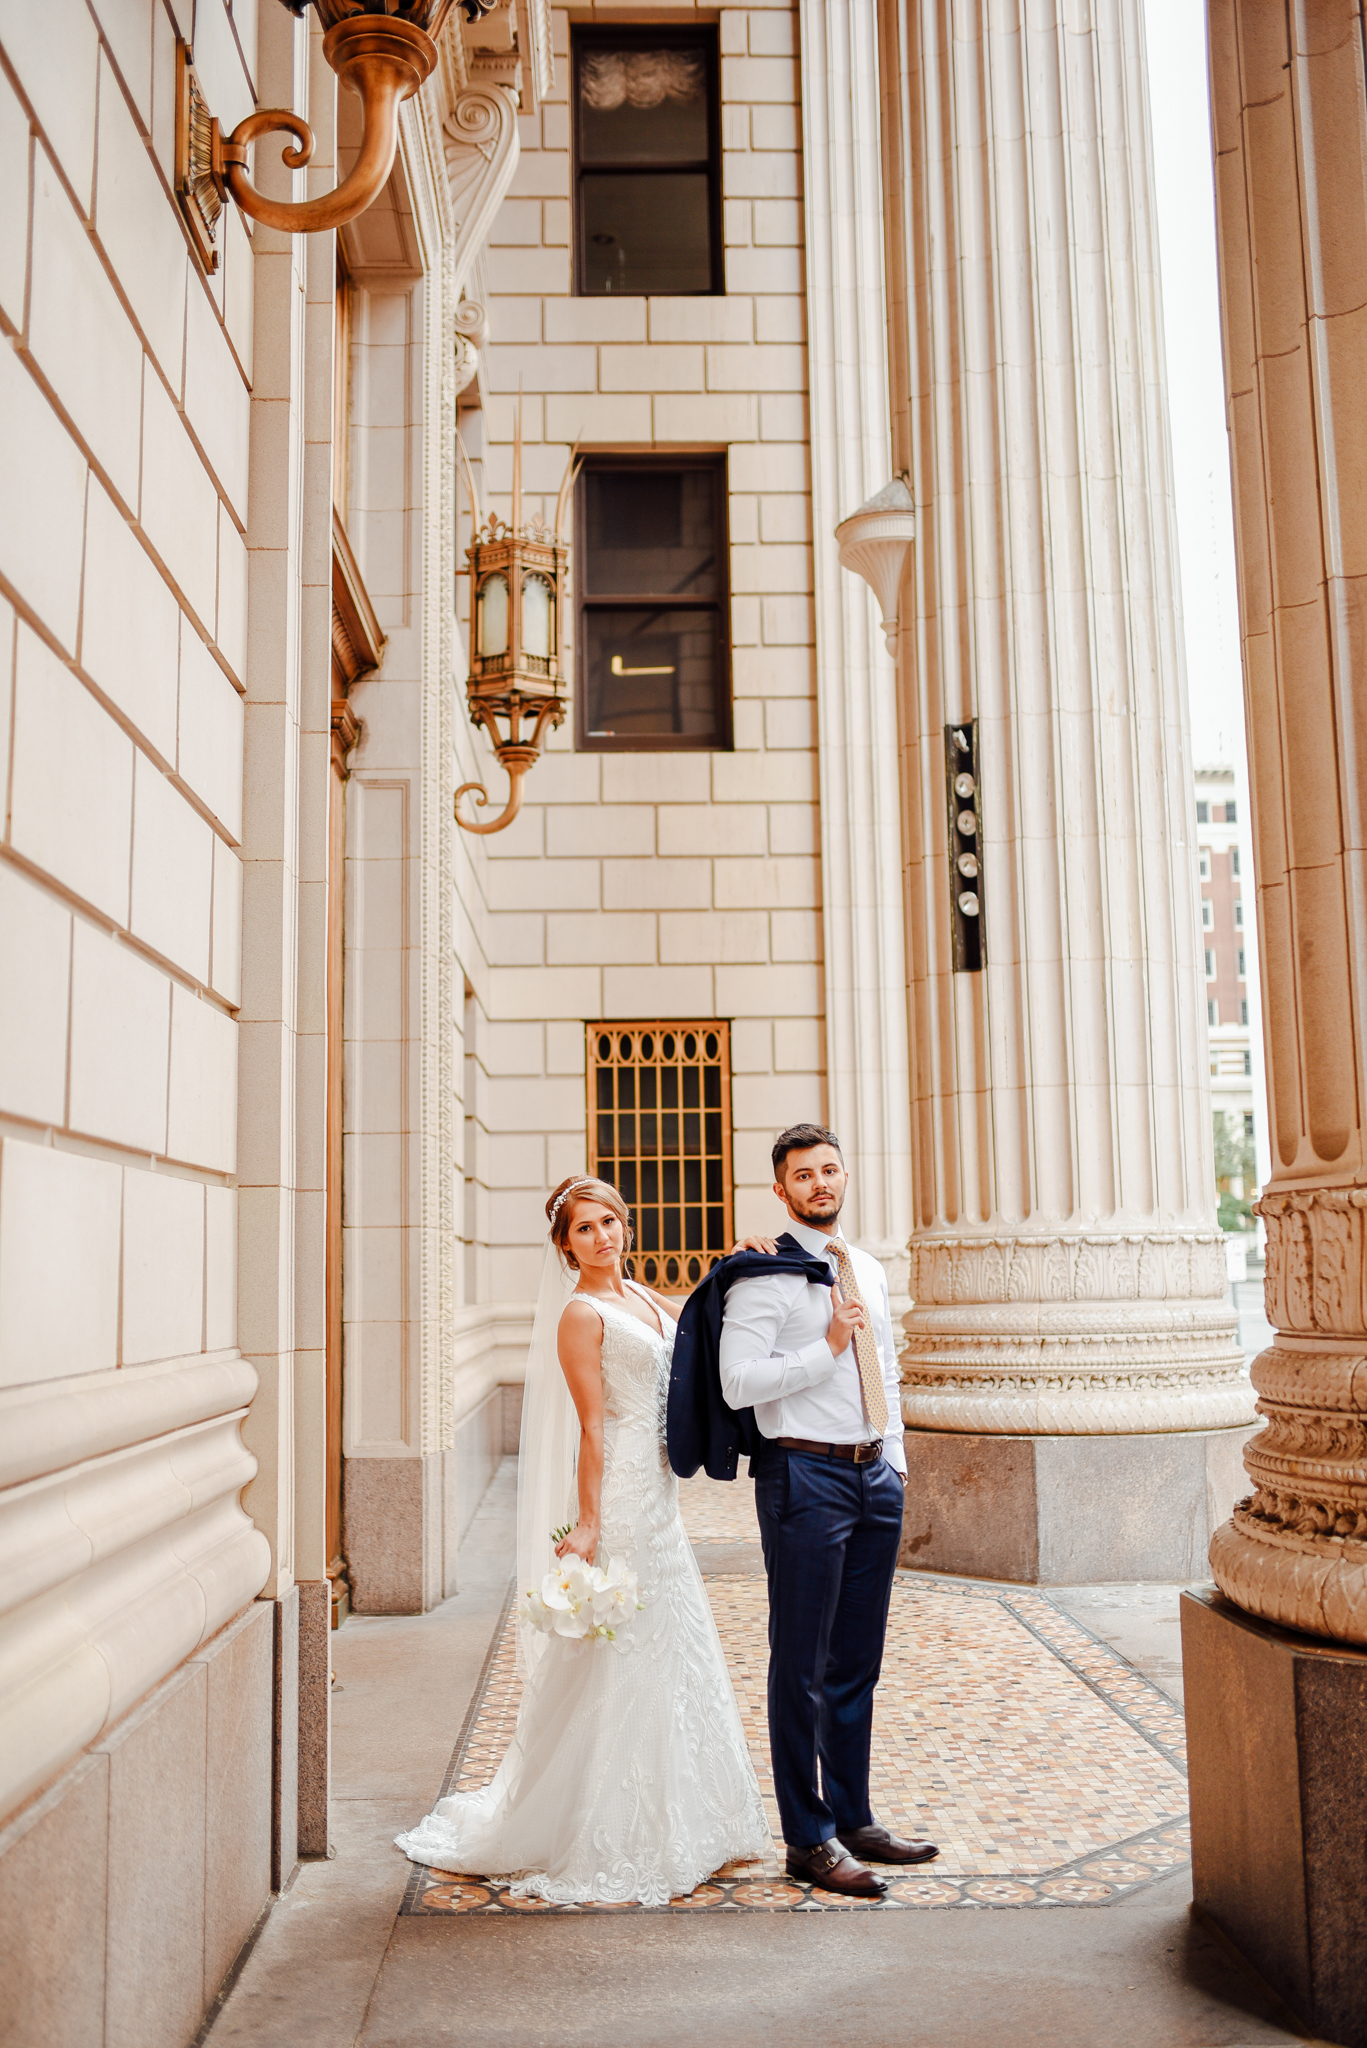 Judy and Theo - Portland Wedding Photographer - 39.jpg